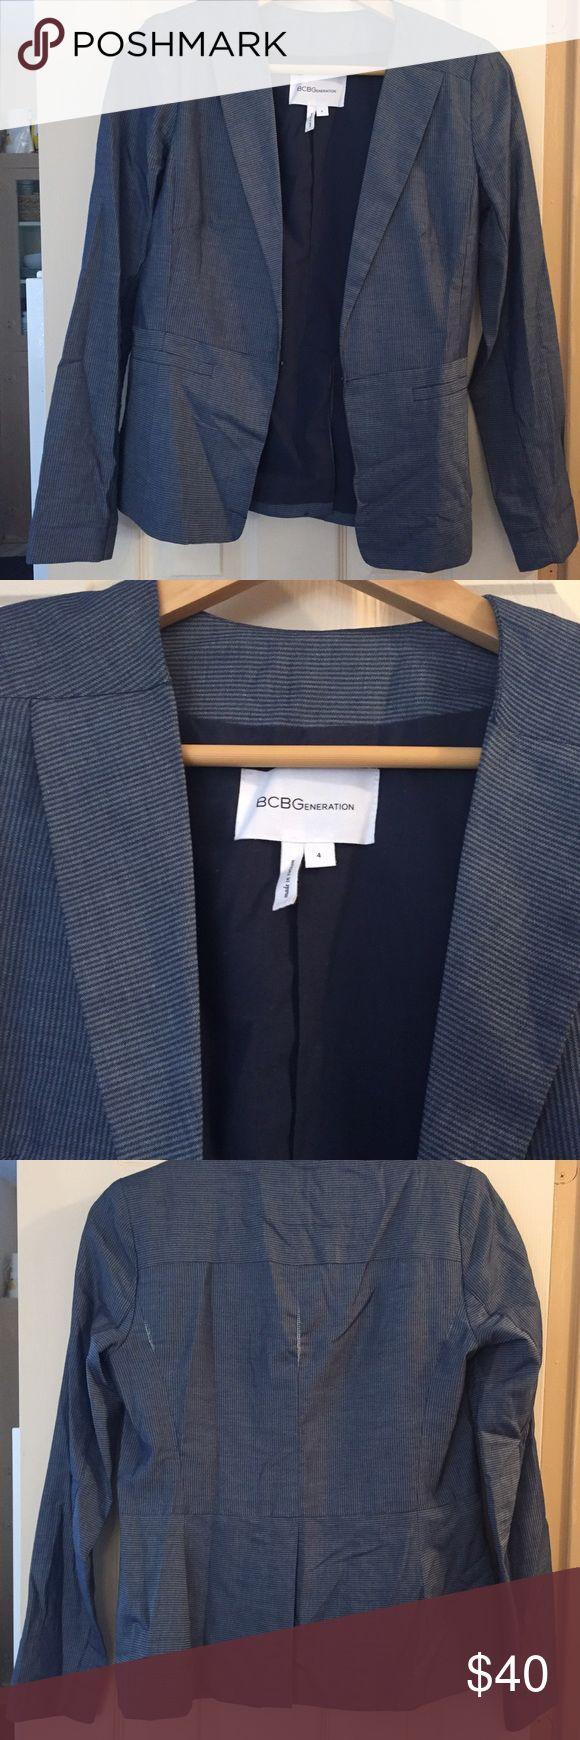 ✨SALE ✨ BCBGeneration Chambray Blazer BCBGeneration Chambray Blazer. Size 4. Worn 2x. BCBGeneration Jackets & Coats Blazers